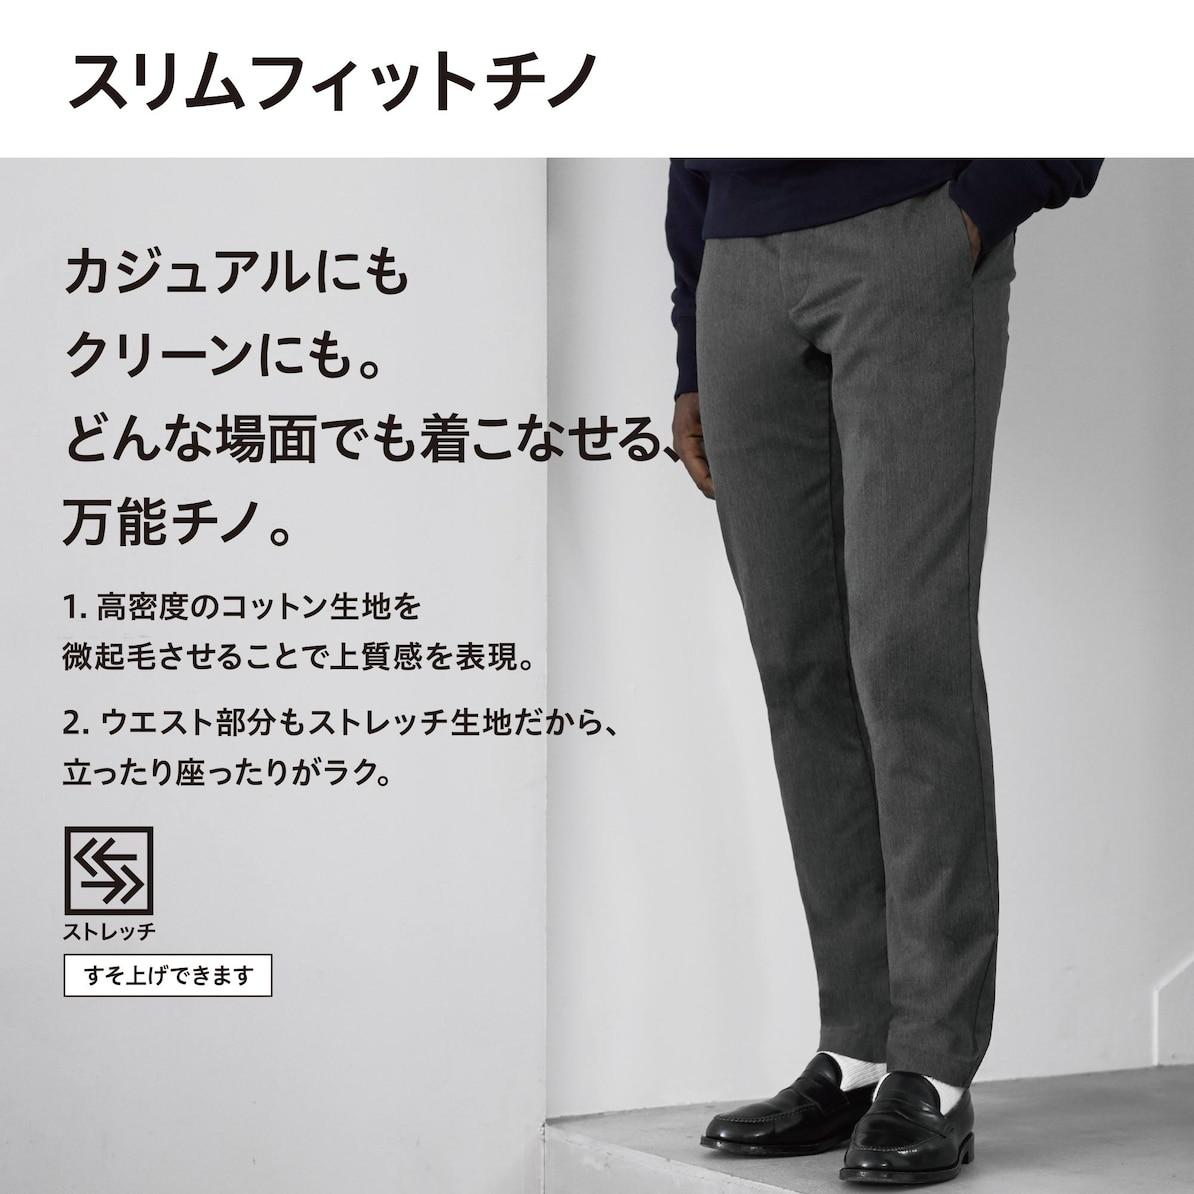 f:id:yamada0221:20201009171119j:plain